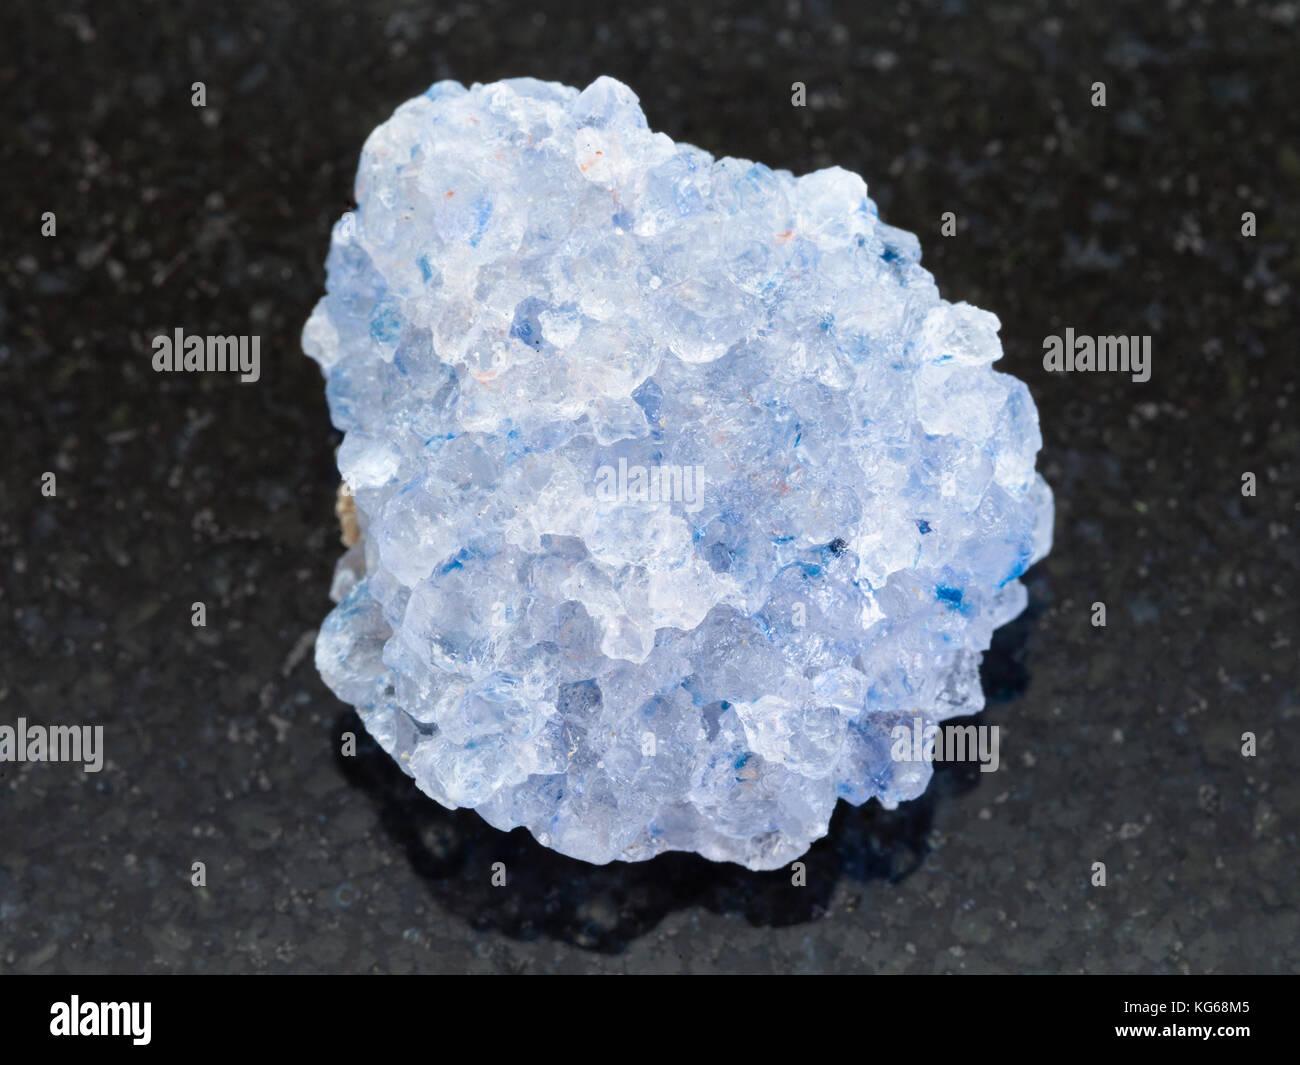 macro shooting of natural mineral rock specimen - rough celestine stone on dark granite background - Stock Image